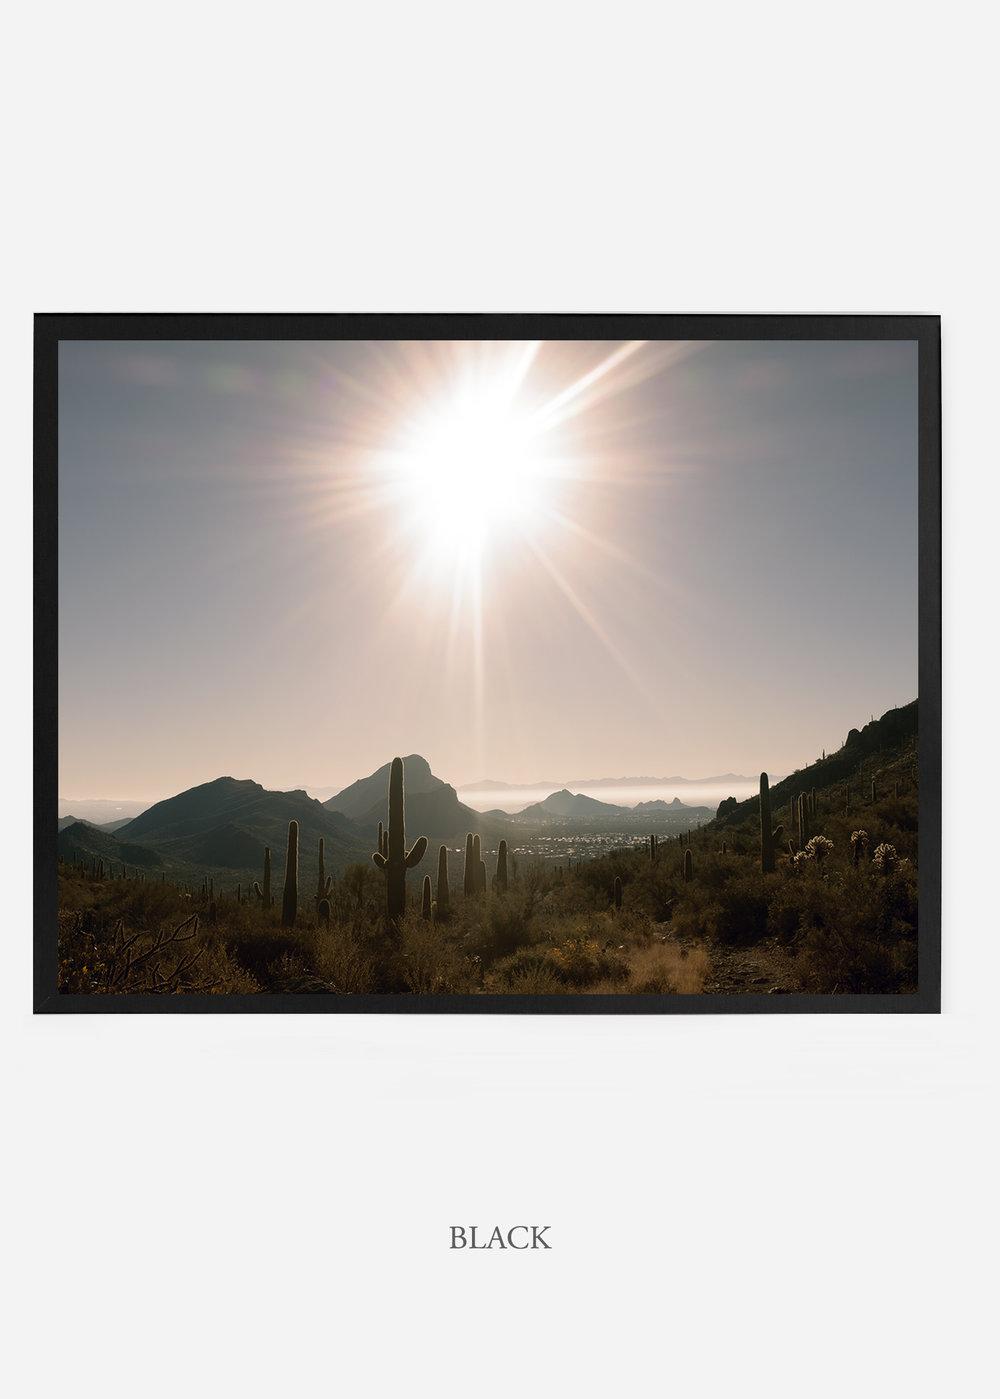 nomat_blackframe-saguaroNo.15-wildercalifornia-art-wallart-cactusprint-homedecor-prints-arizona-botanical-artwork-interiordesign.jpg